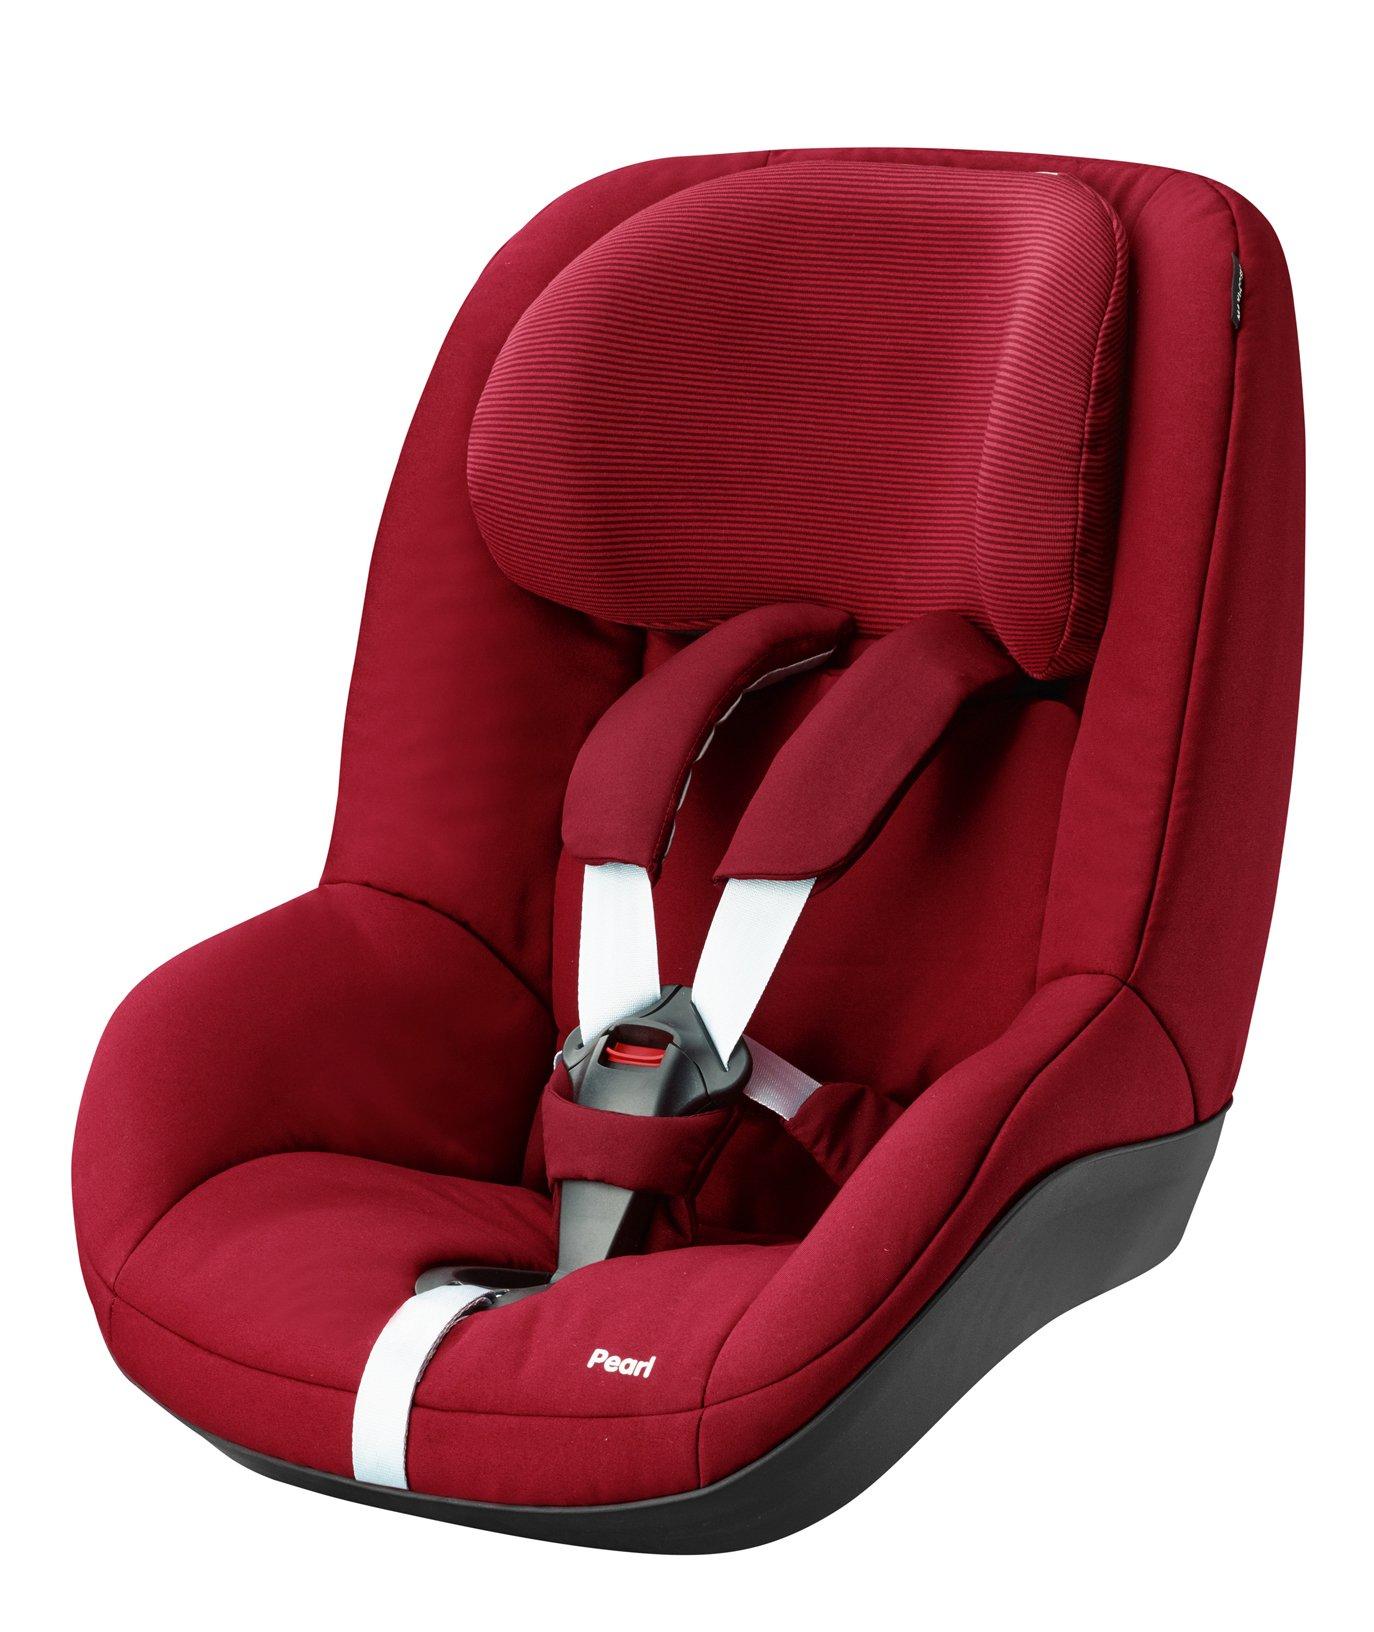 Maxi-Cosi 63409641Pearl Children's Seat, Group 1, 9-18kg Maxi-Cosi  68